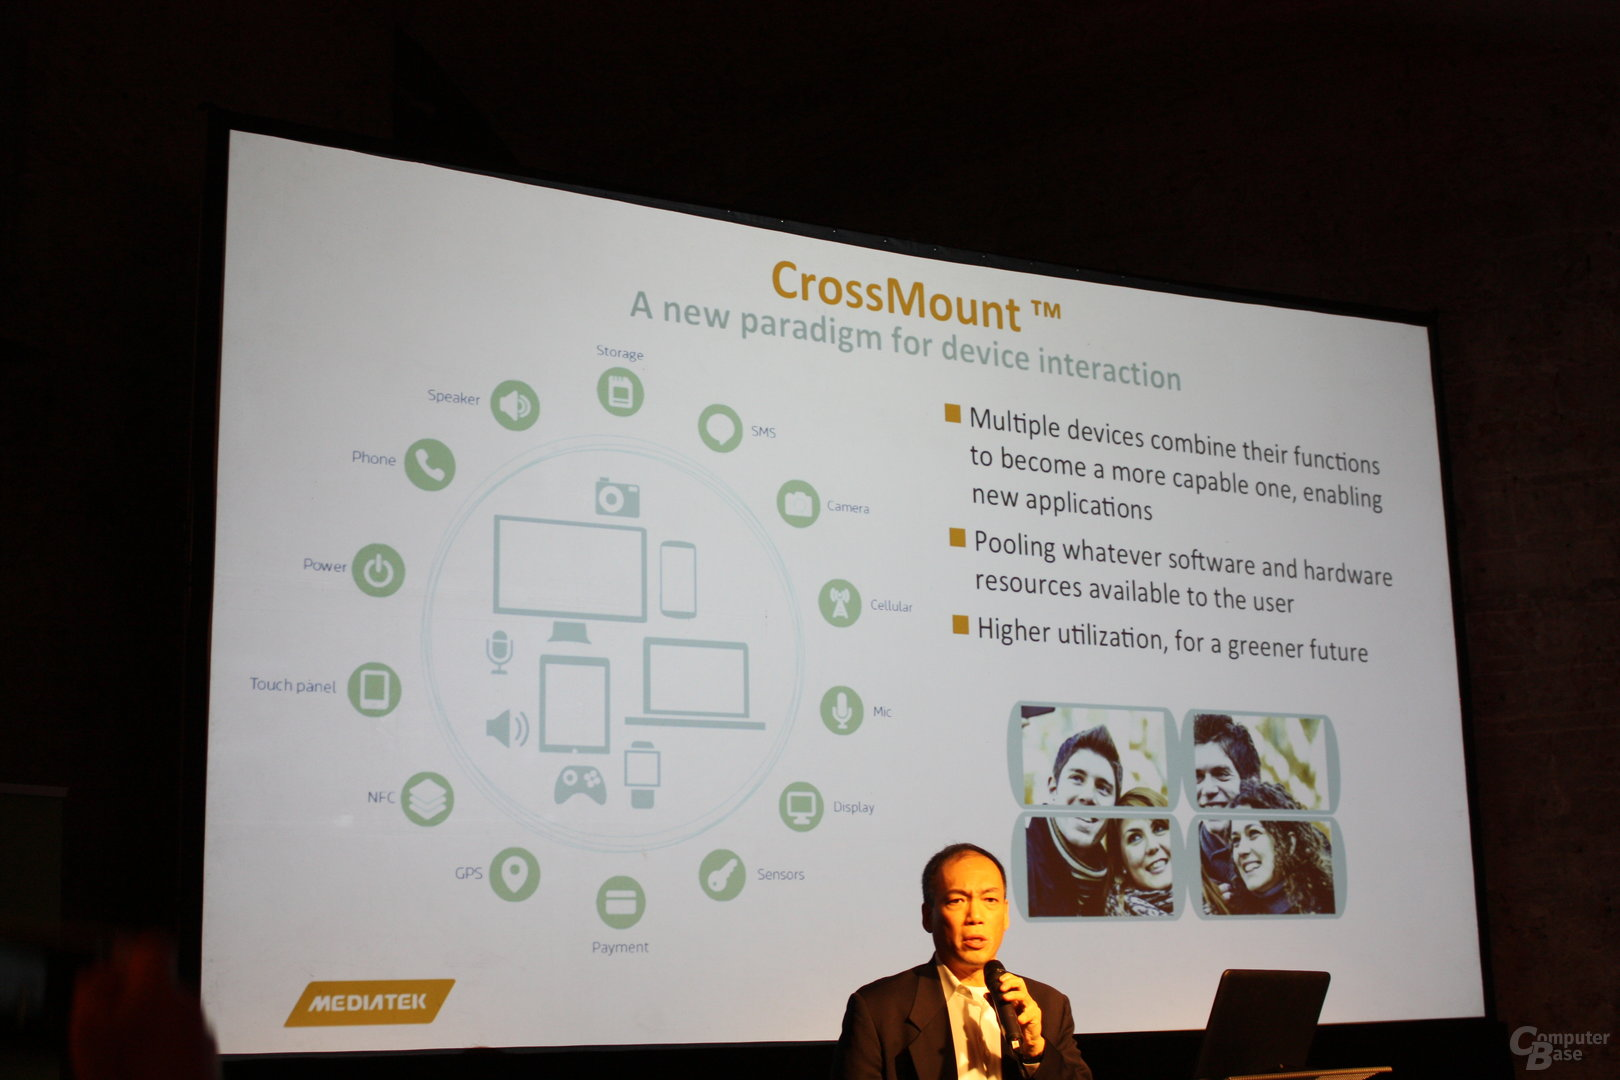 Präsentation von MediaTek CrossMount